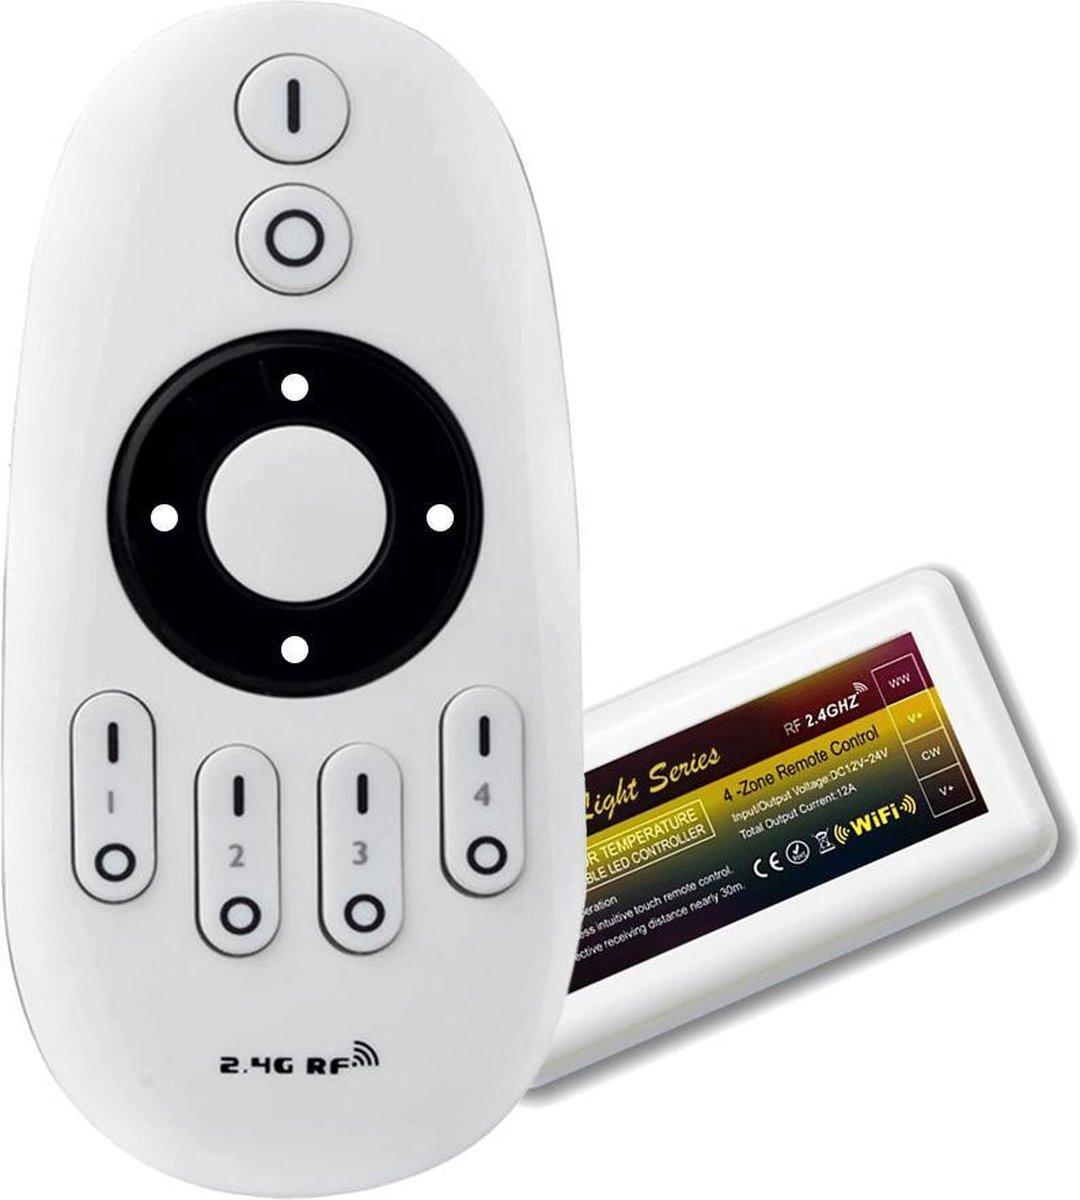 Milight 4-zone afstandsbediening voor Dual White led strips en lampen